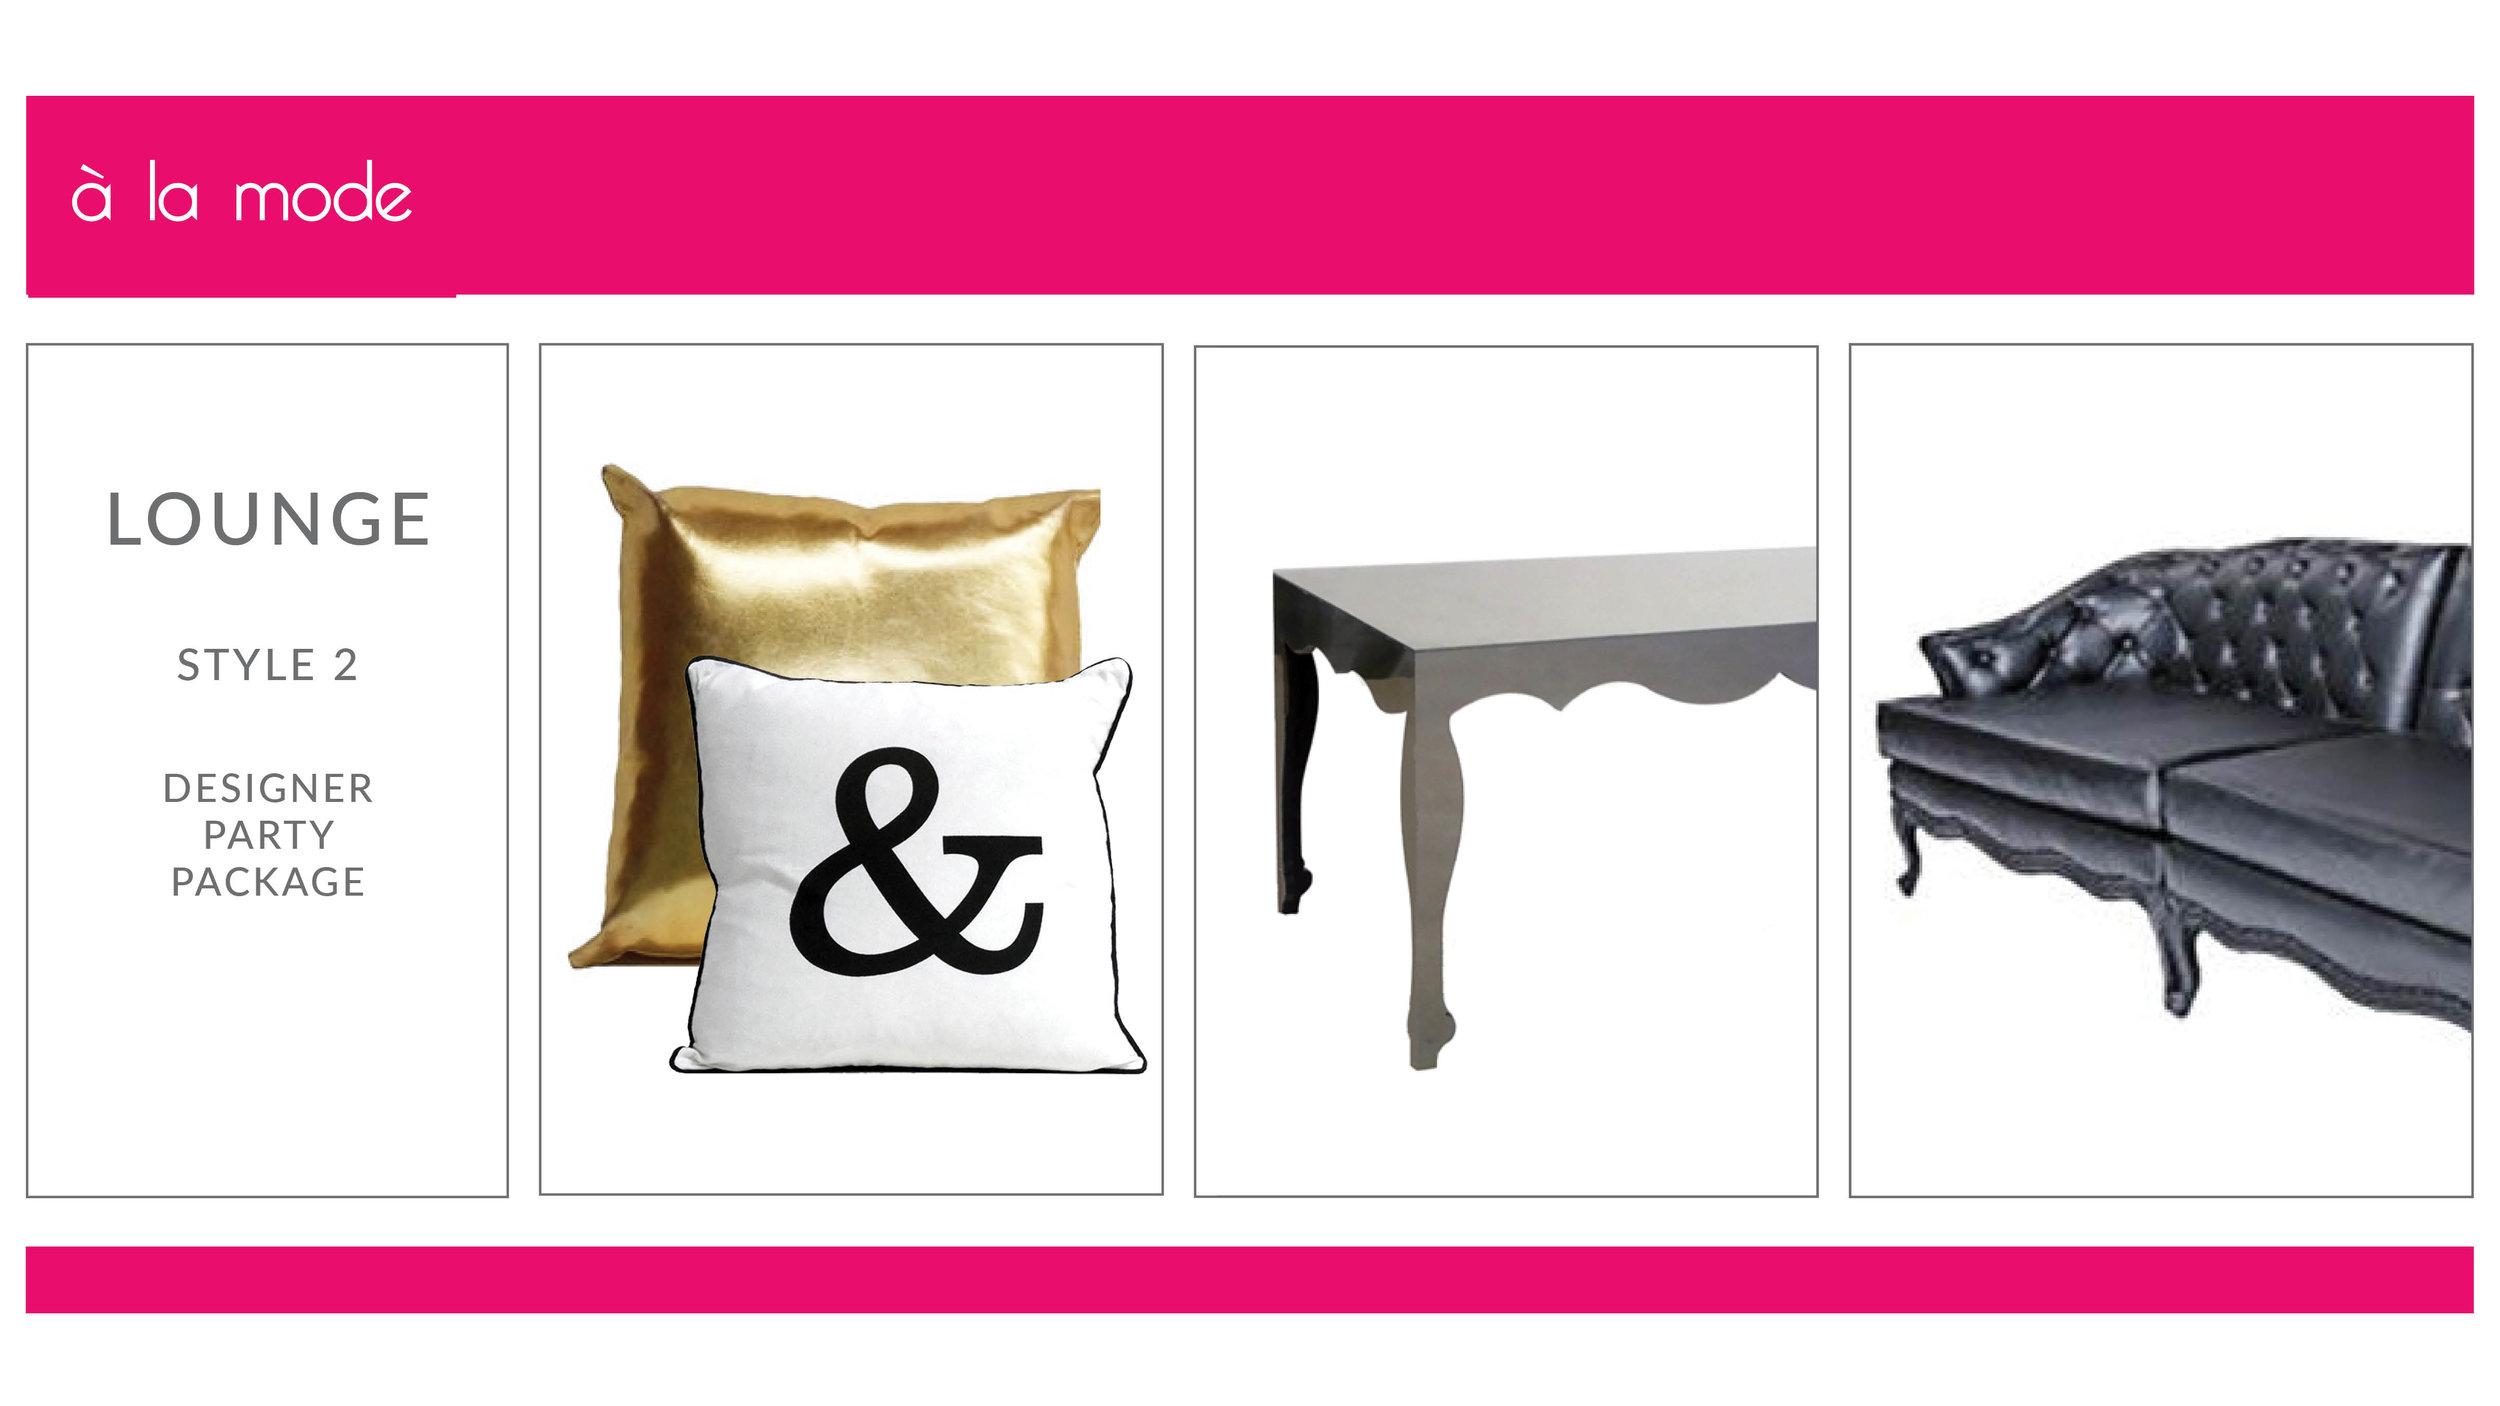 A La Mode Lounge Package: Style 2